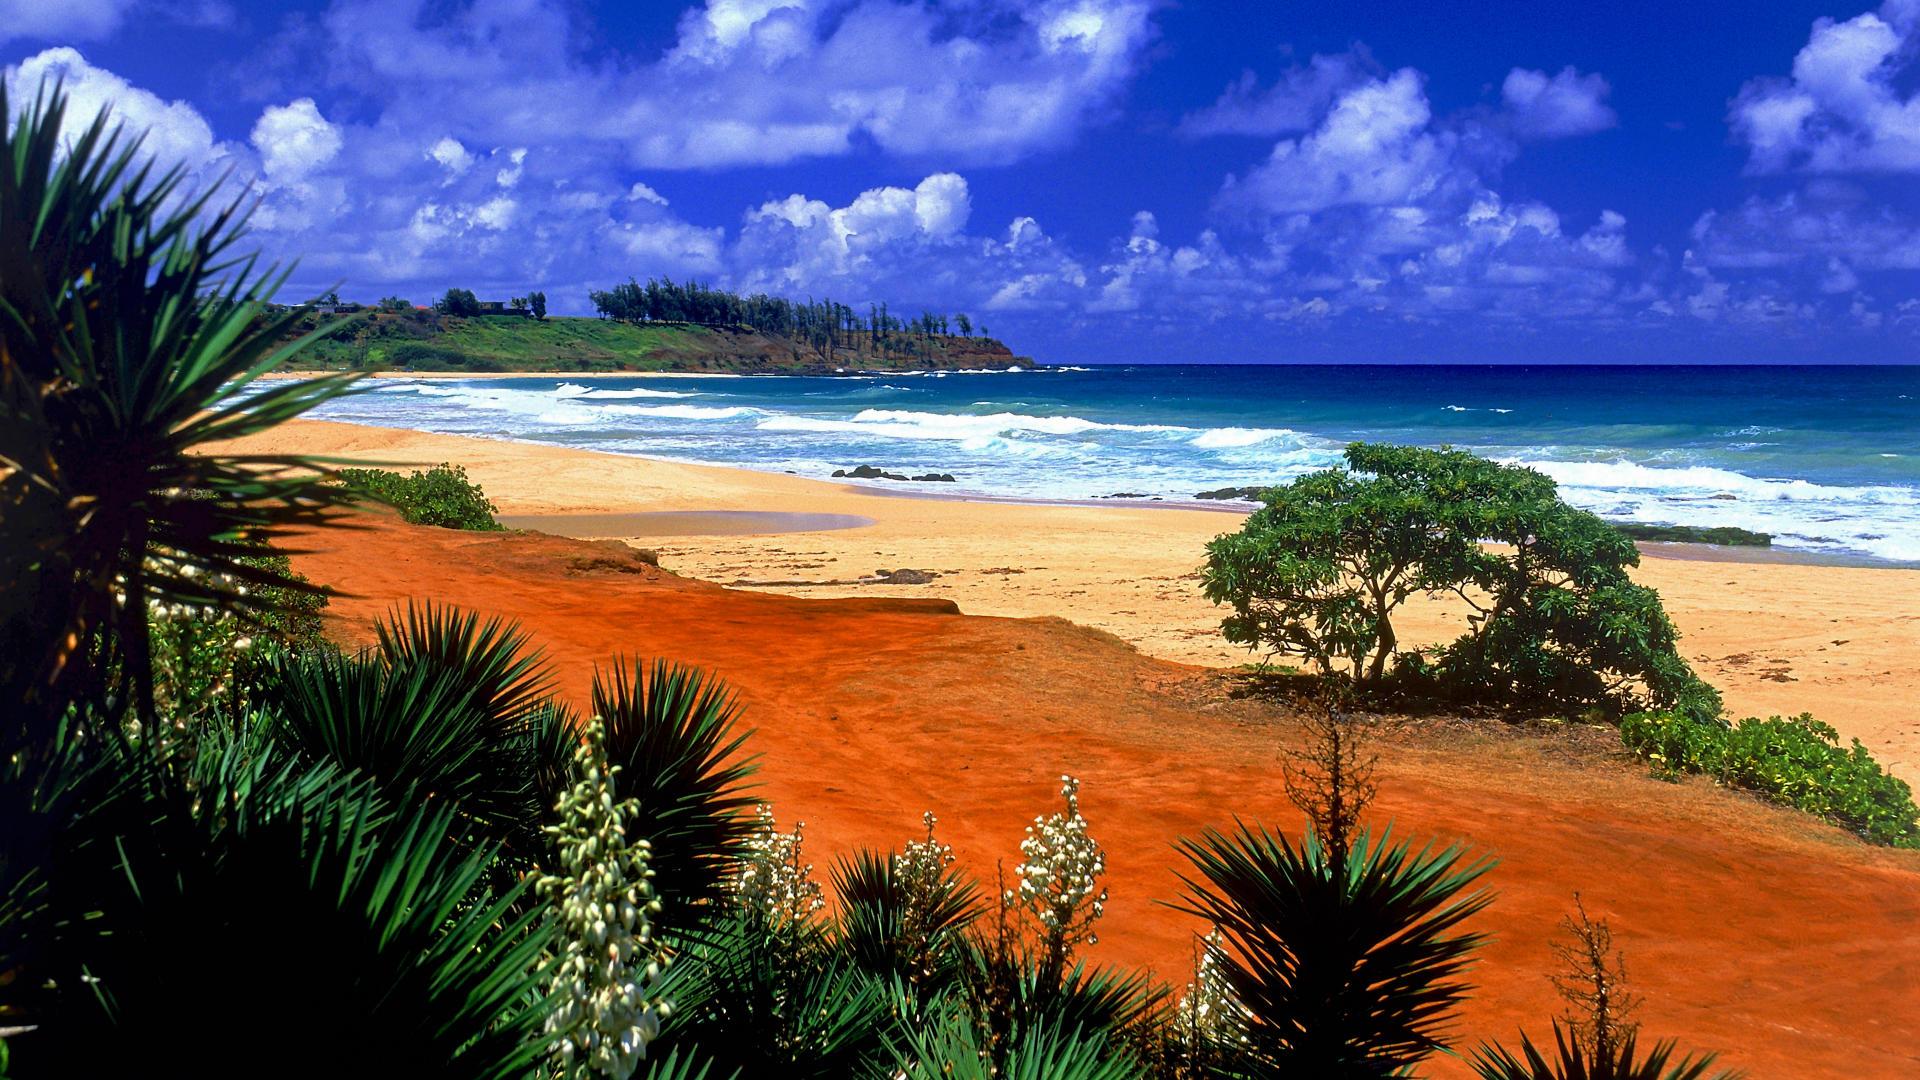 backgrounds beach desktop hawaii kealia kauai